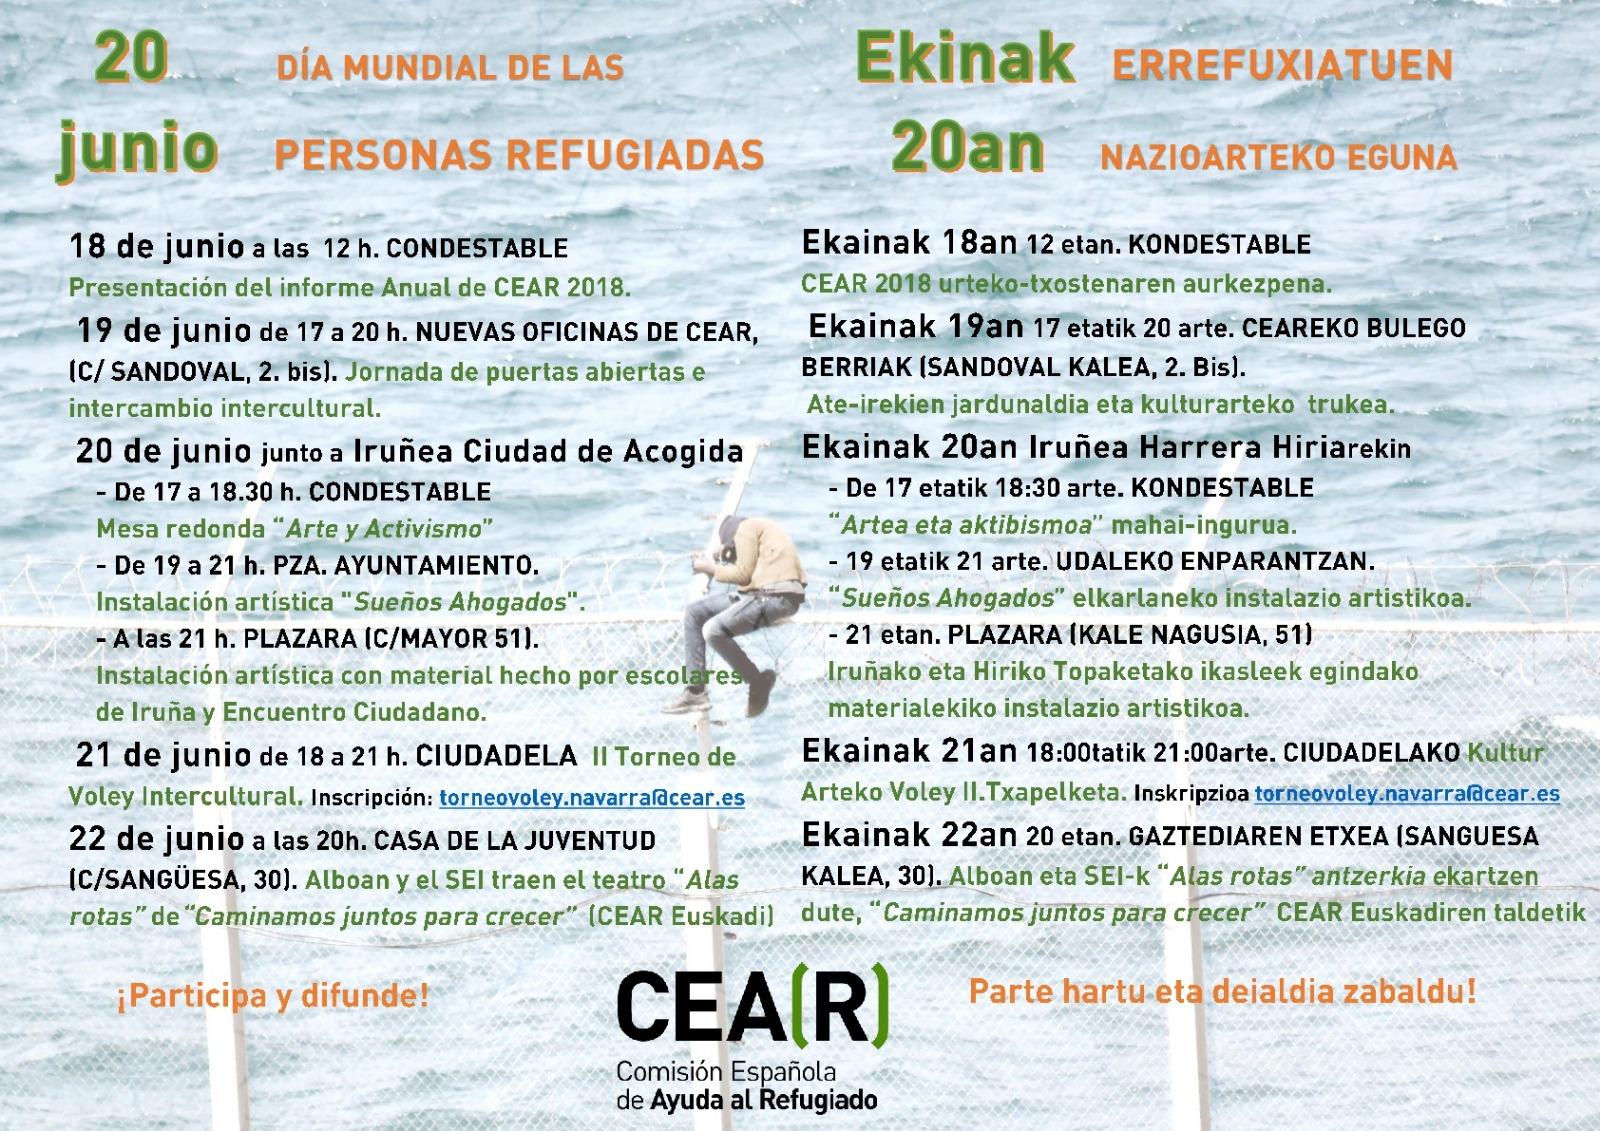 20 de Junio. Día de las personas refugiadas/ Ekinak 20 an  Errefuxiatuen Nazioarteko Eguna (CEAR) @ Varios lugares